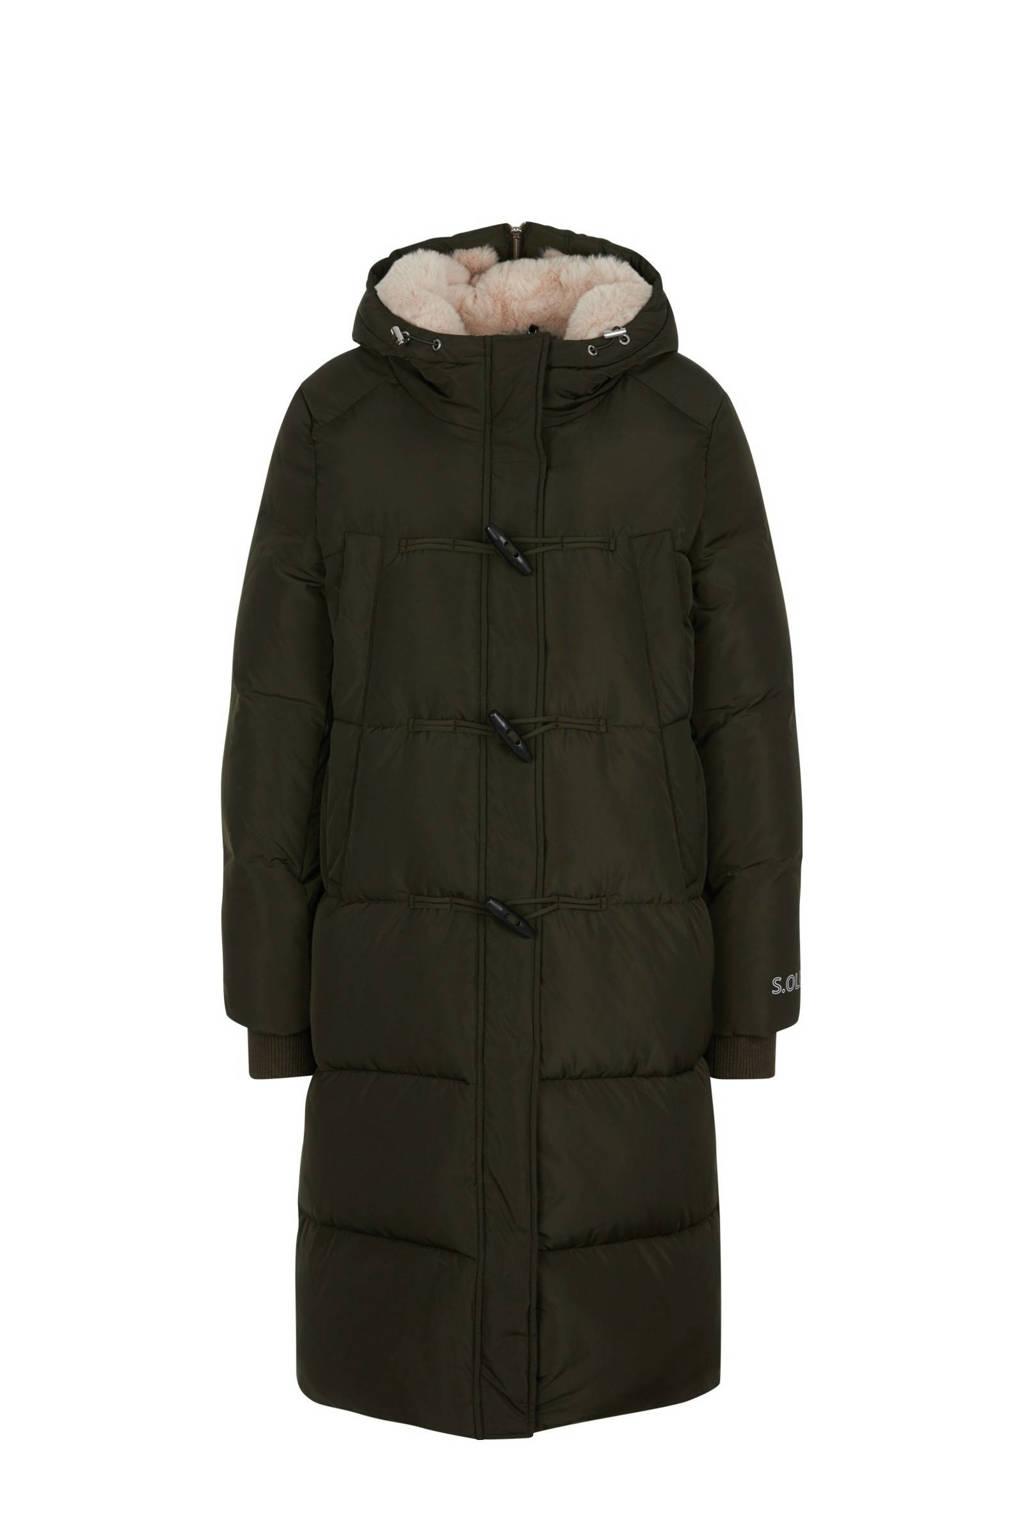 s.Oliver gewatteerde jas donkergroen met teddy voering, Donkergroen